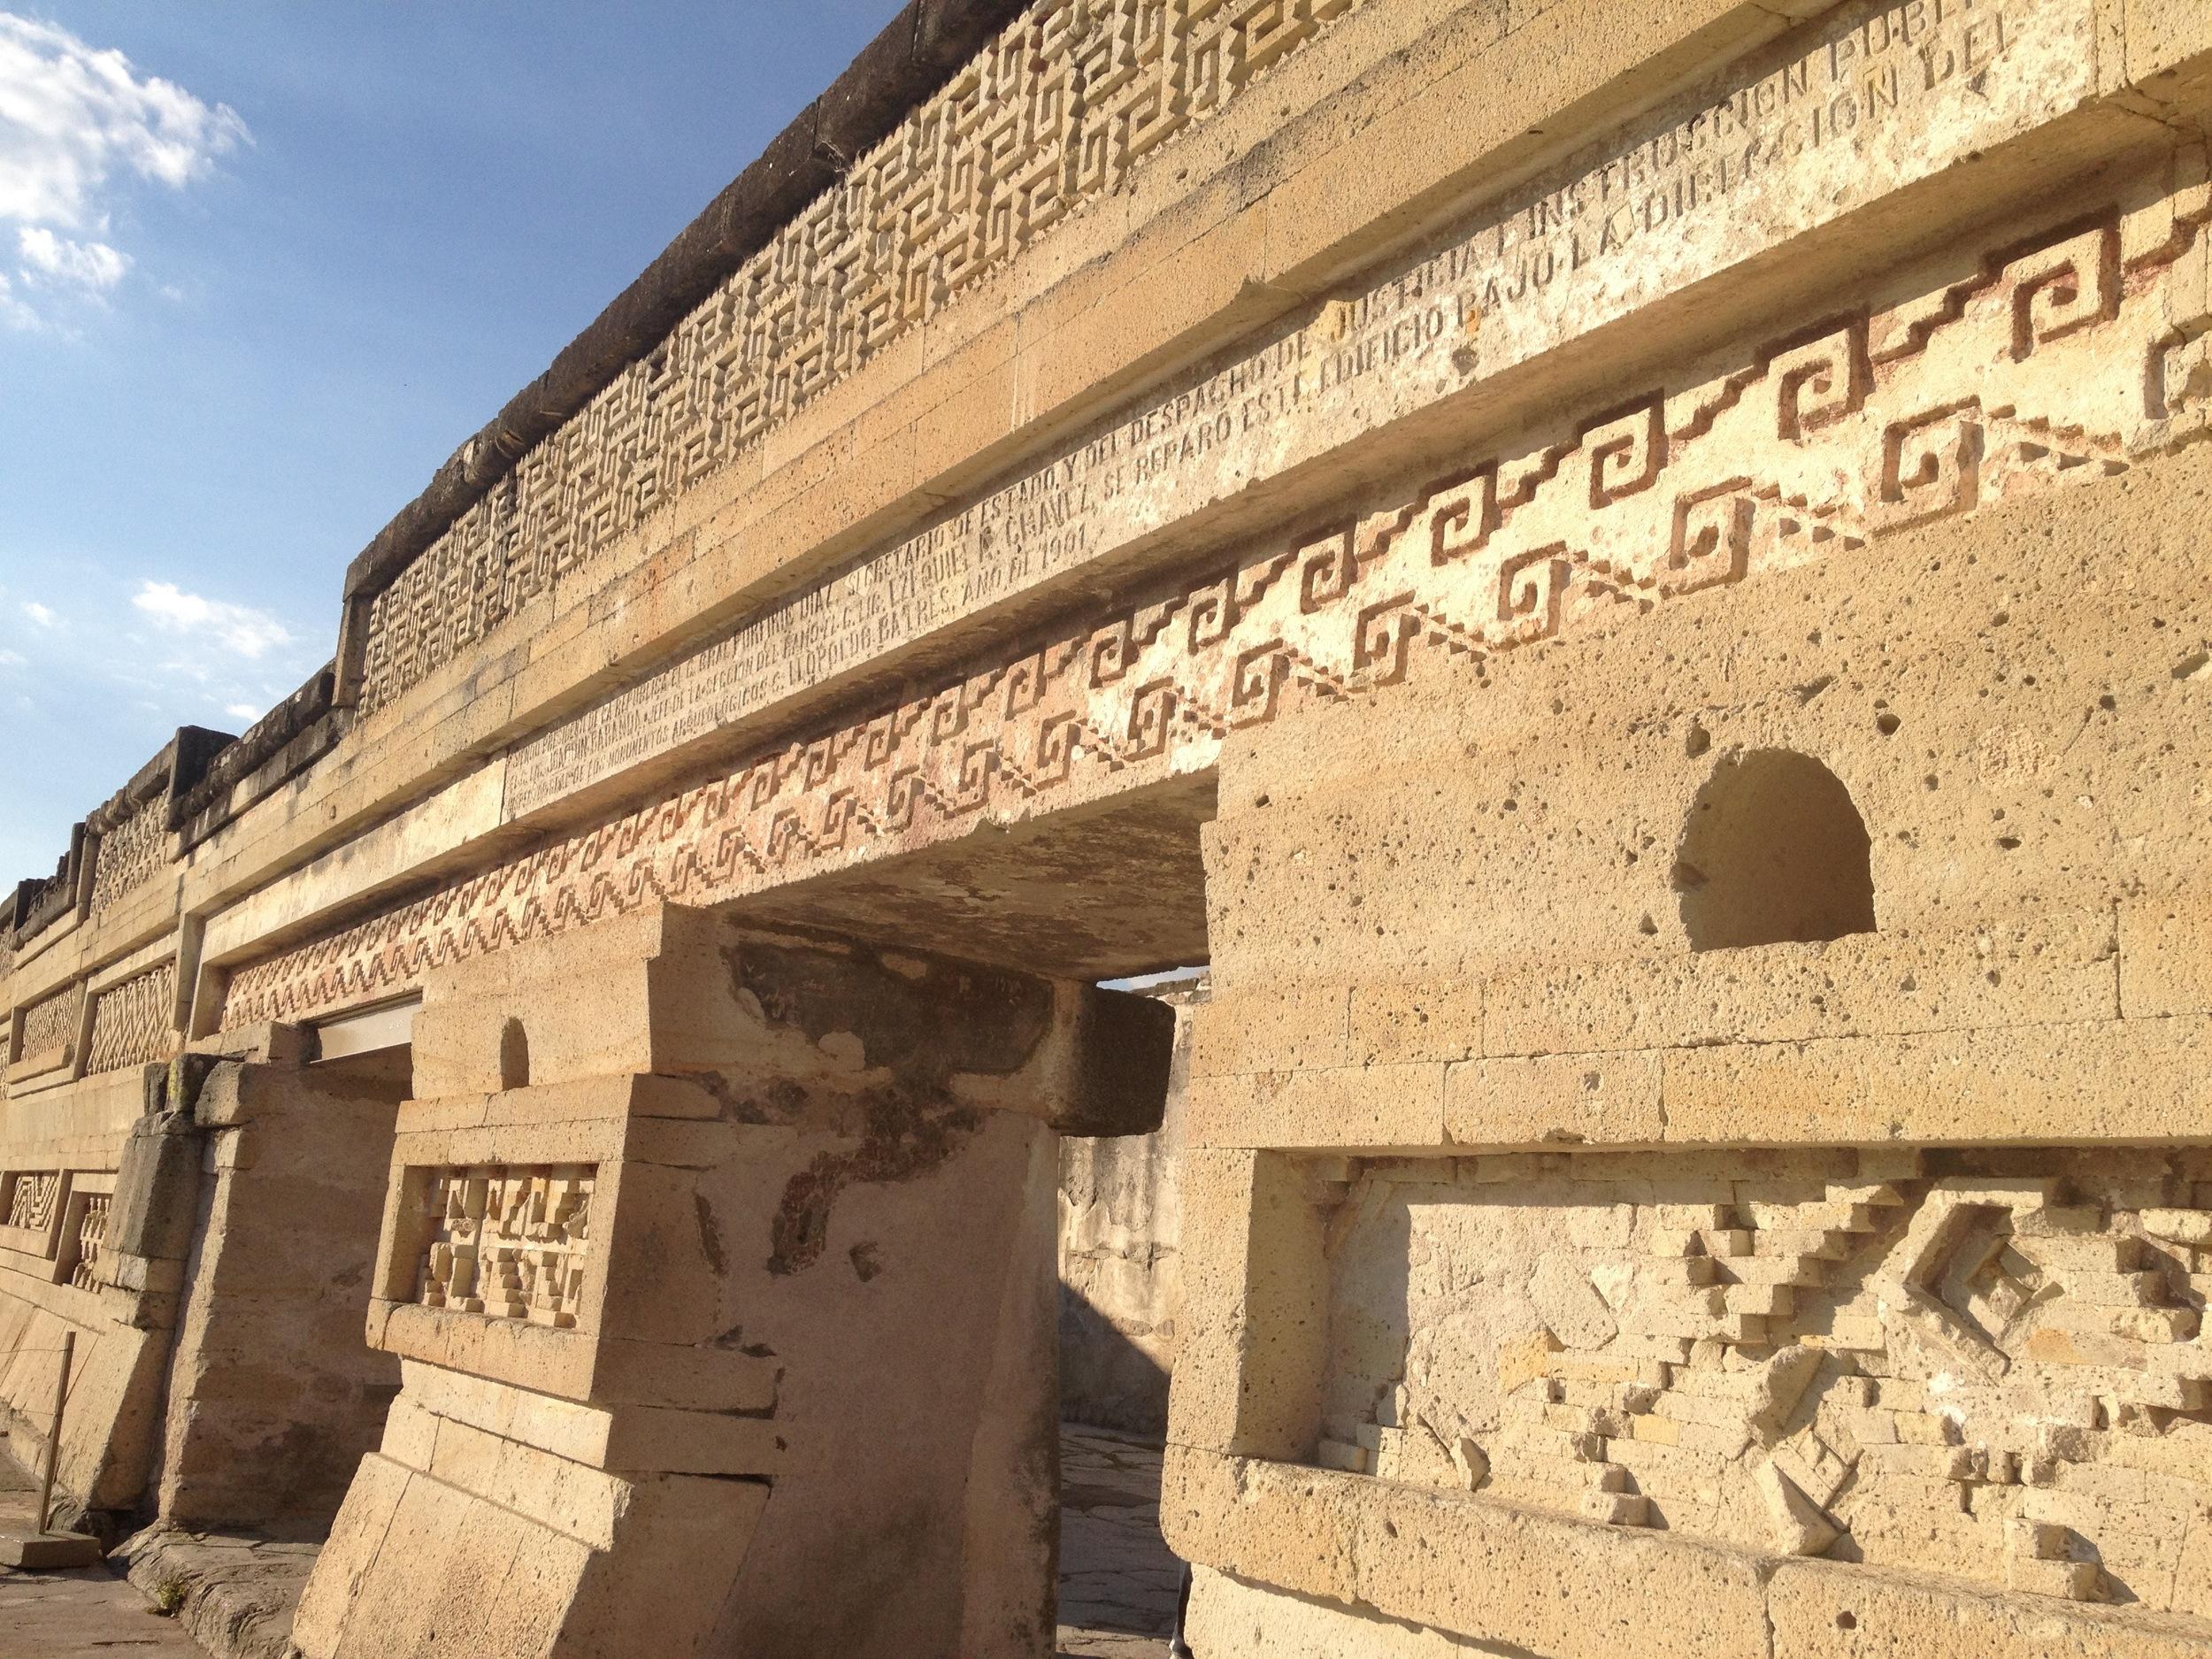 A Zapotec ruin near Oaxaca, haven't been to Giza yet;)